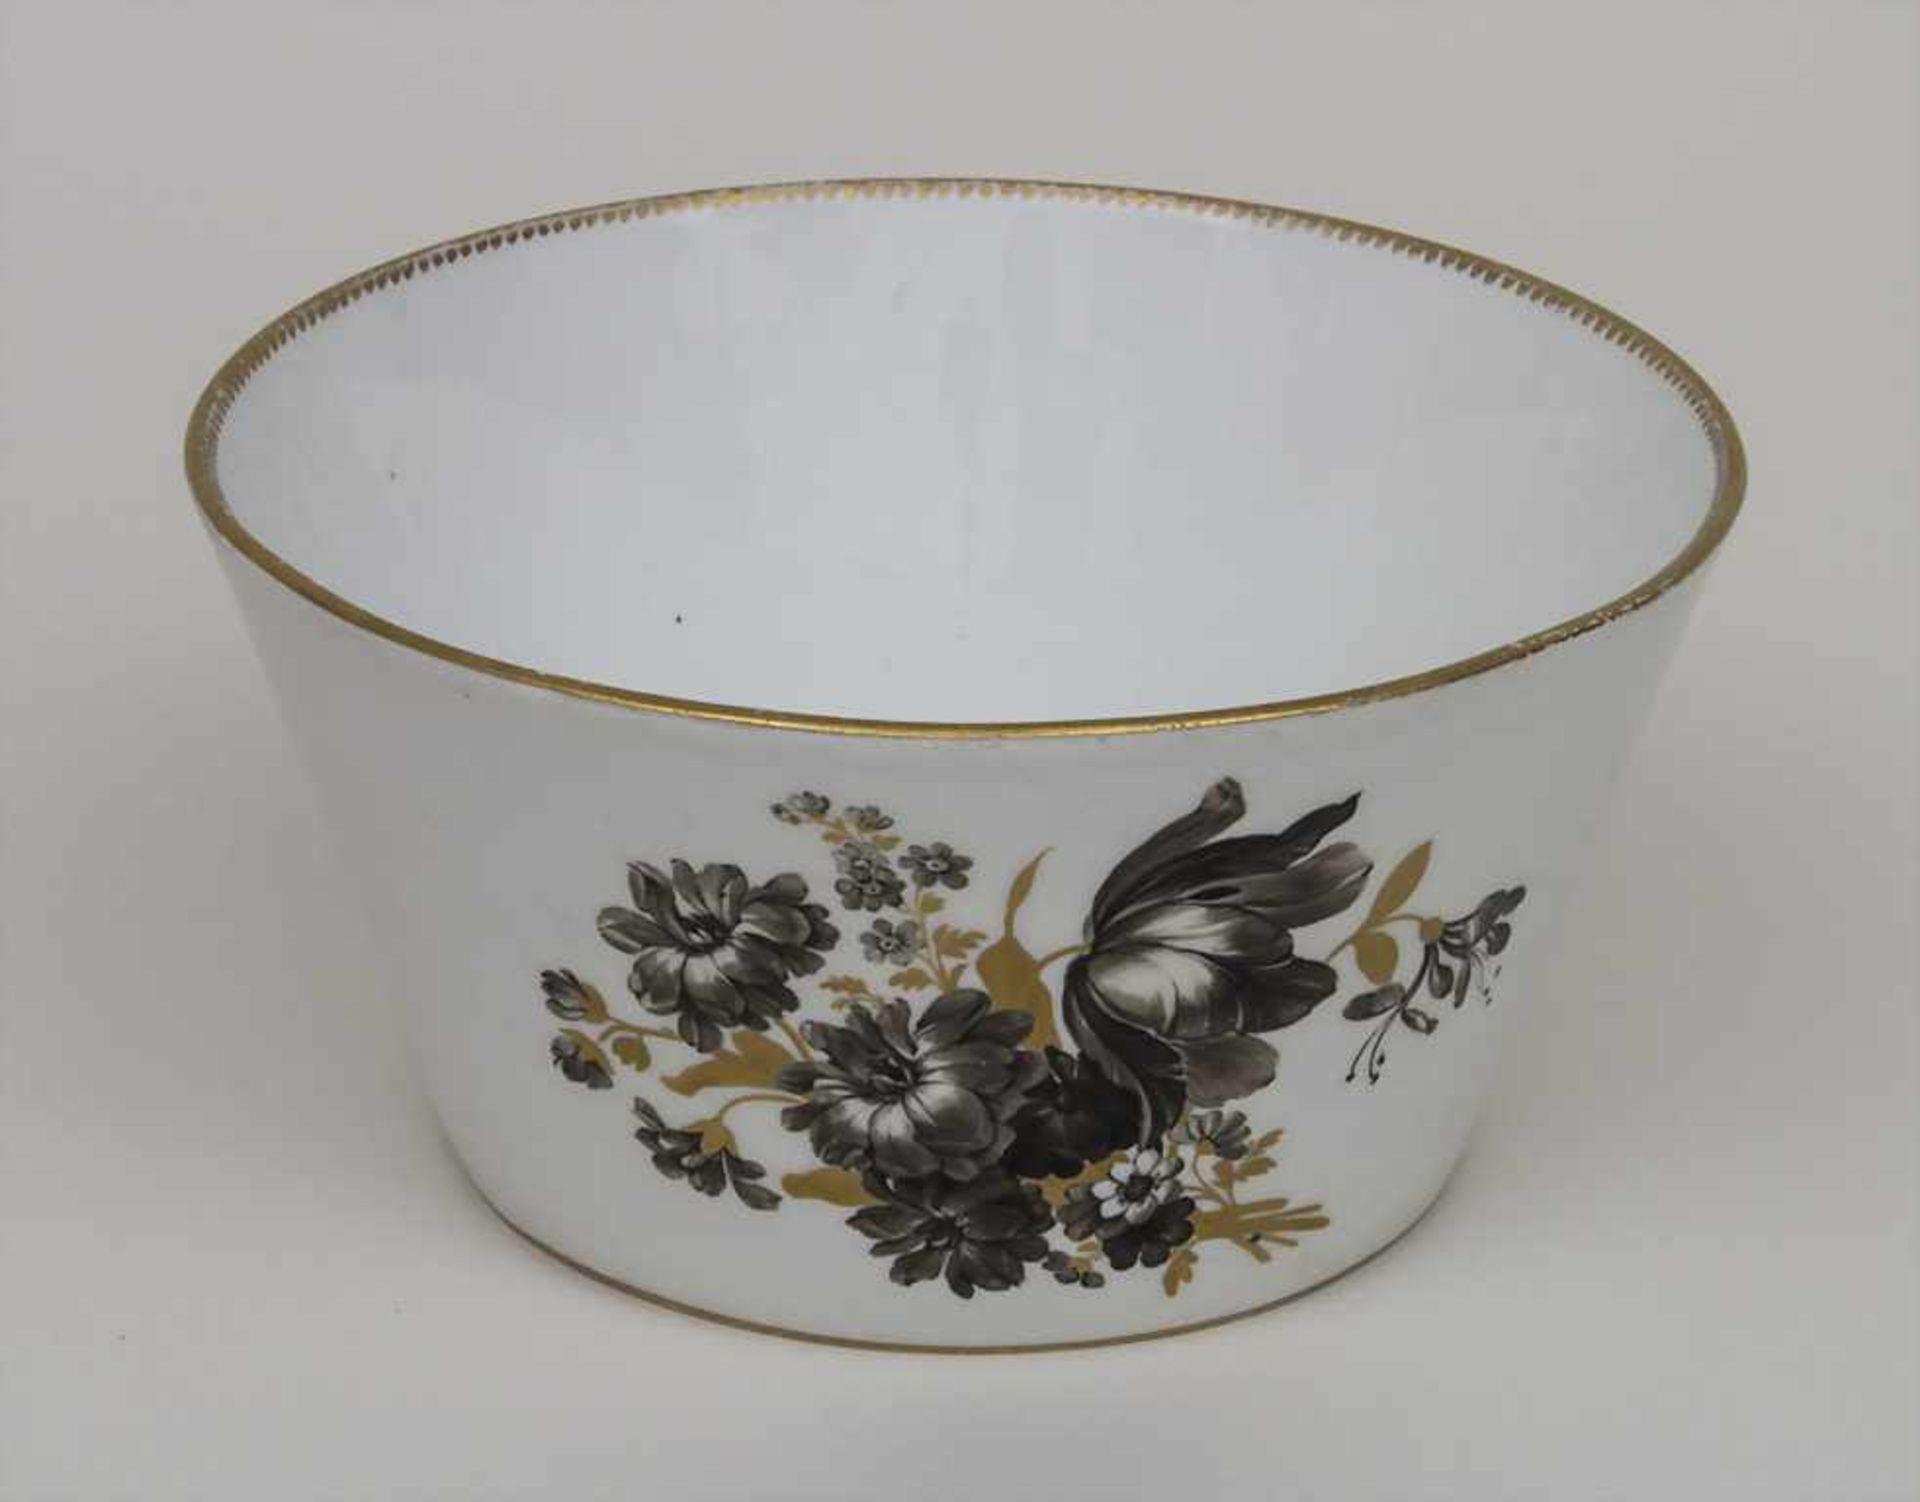 Schale mit Blumenbouquets / A bowl with bouquets of flowers, Meissen, um 1774-1814 Material: - Bild 2 aus 4